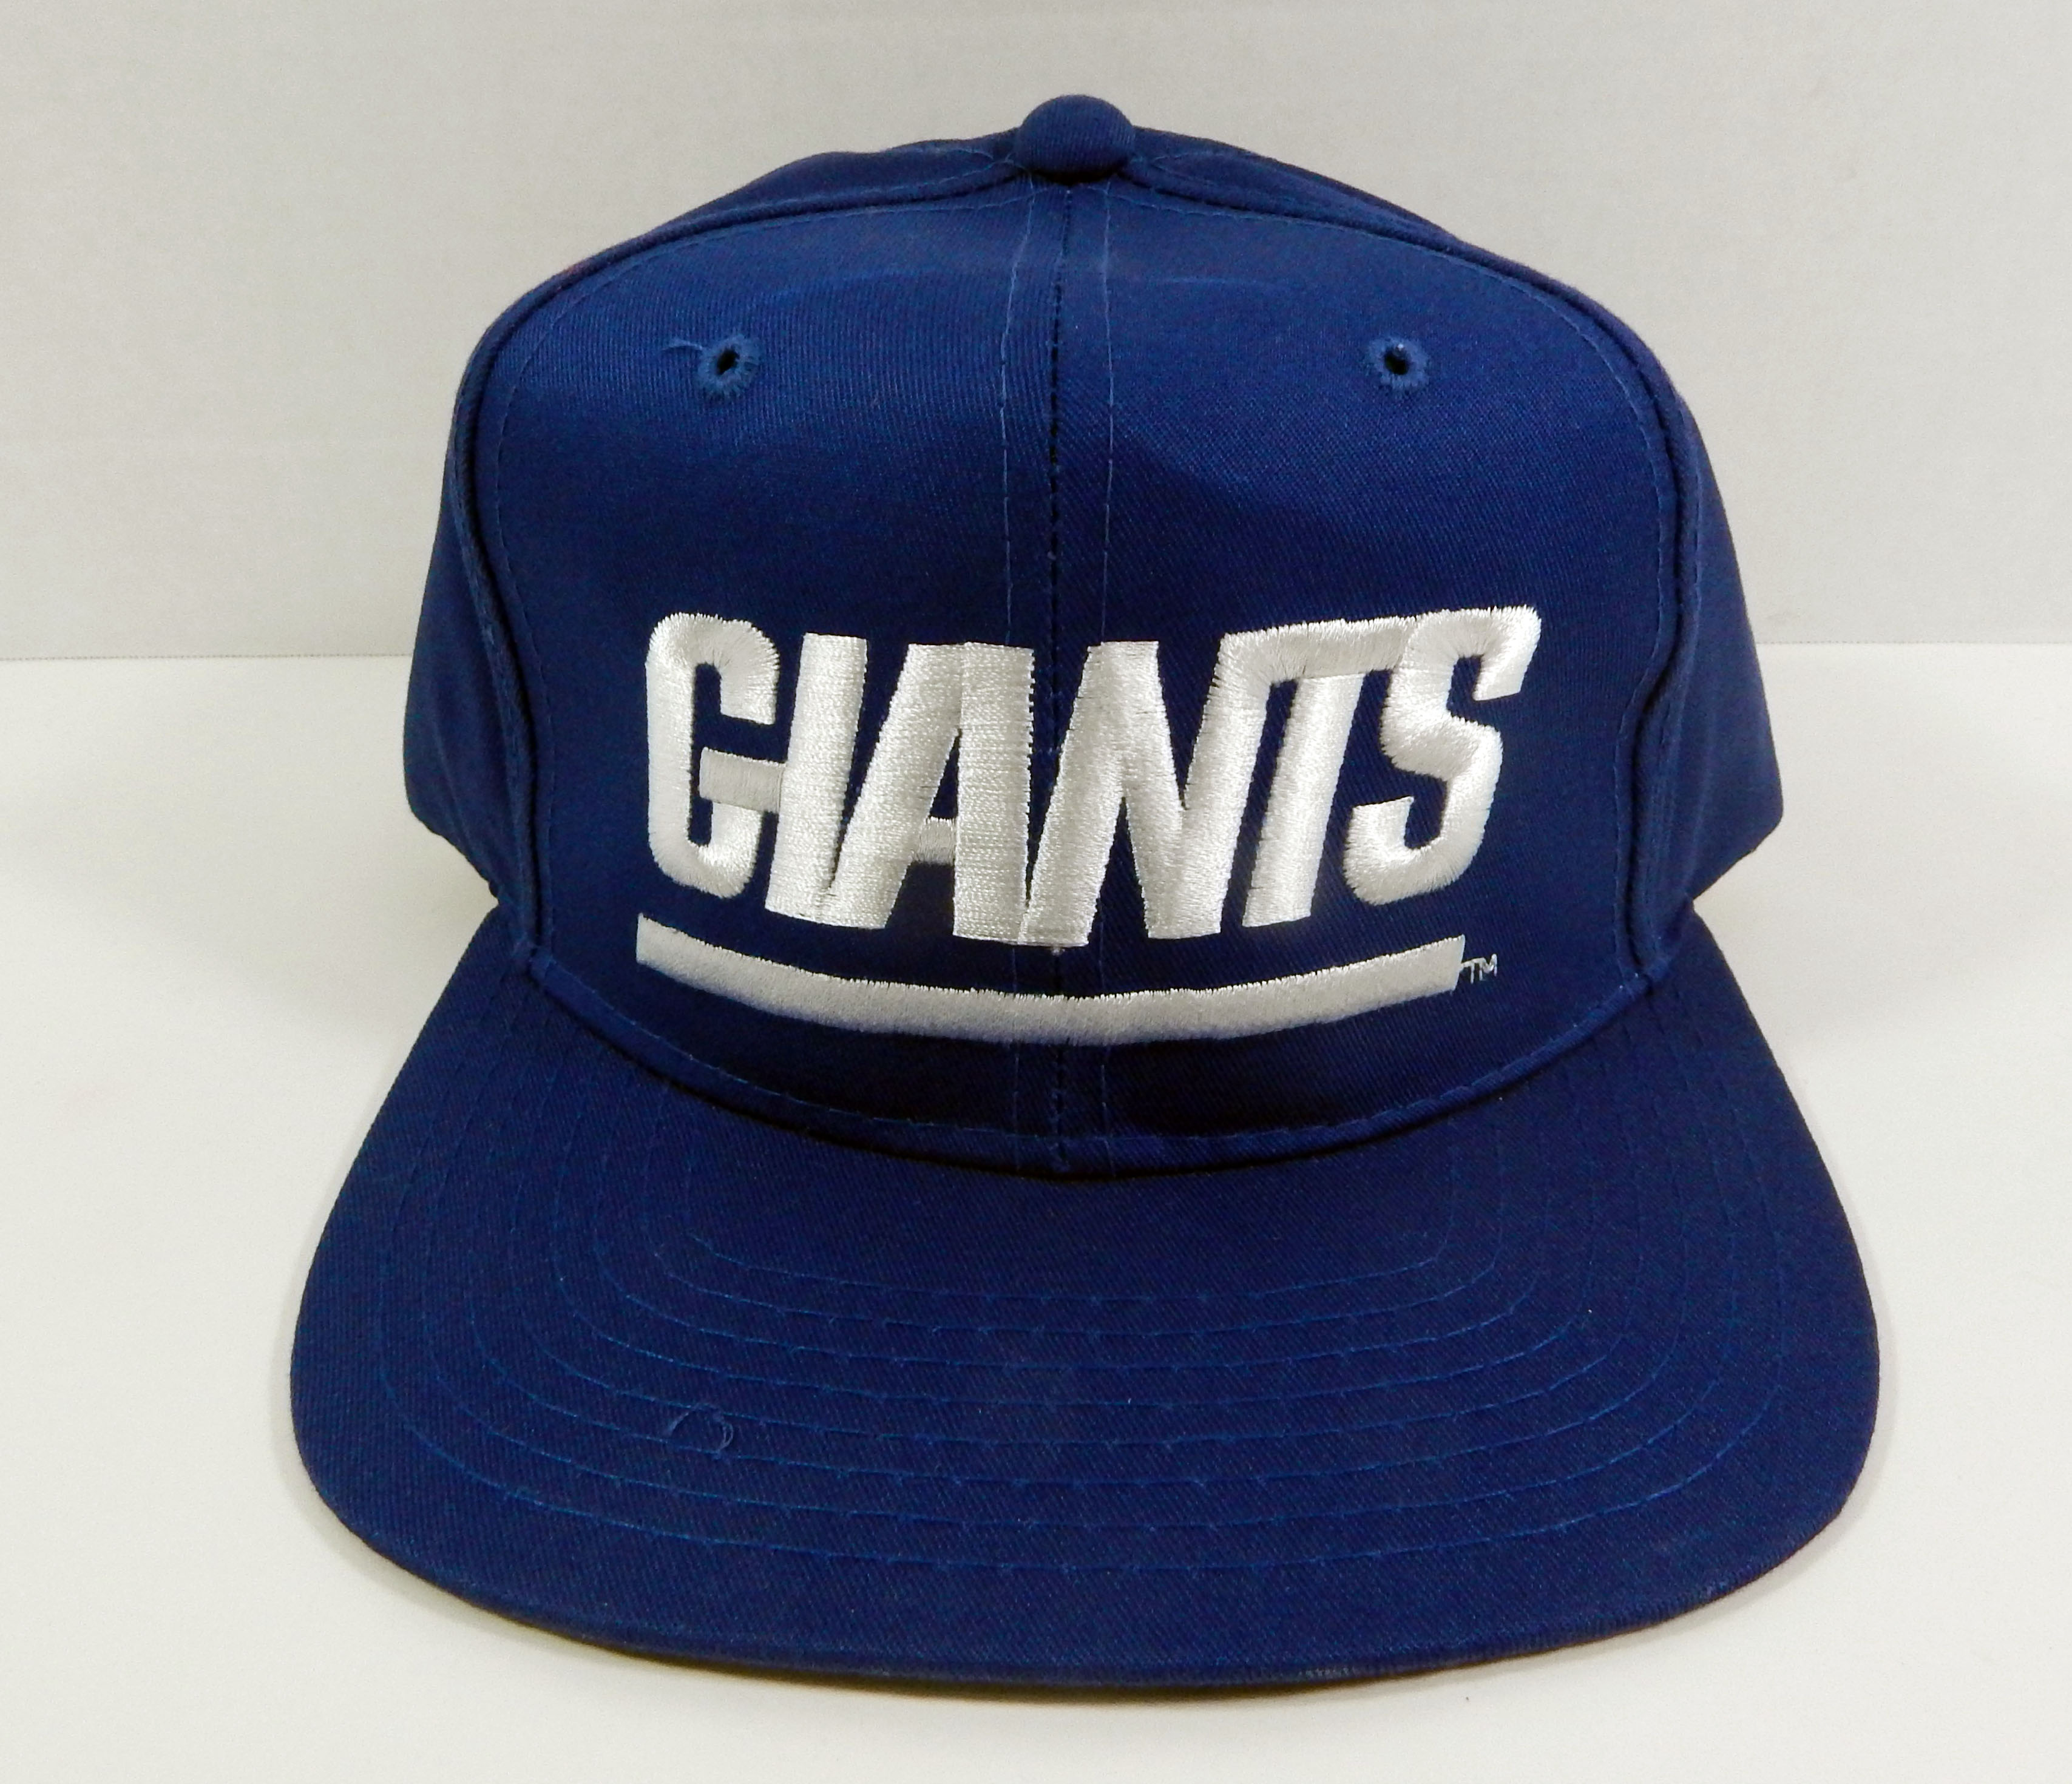 0b7913180da Details about Vintage New York Giants Blue White Script Snapback Hat New  Era NWT